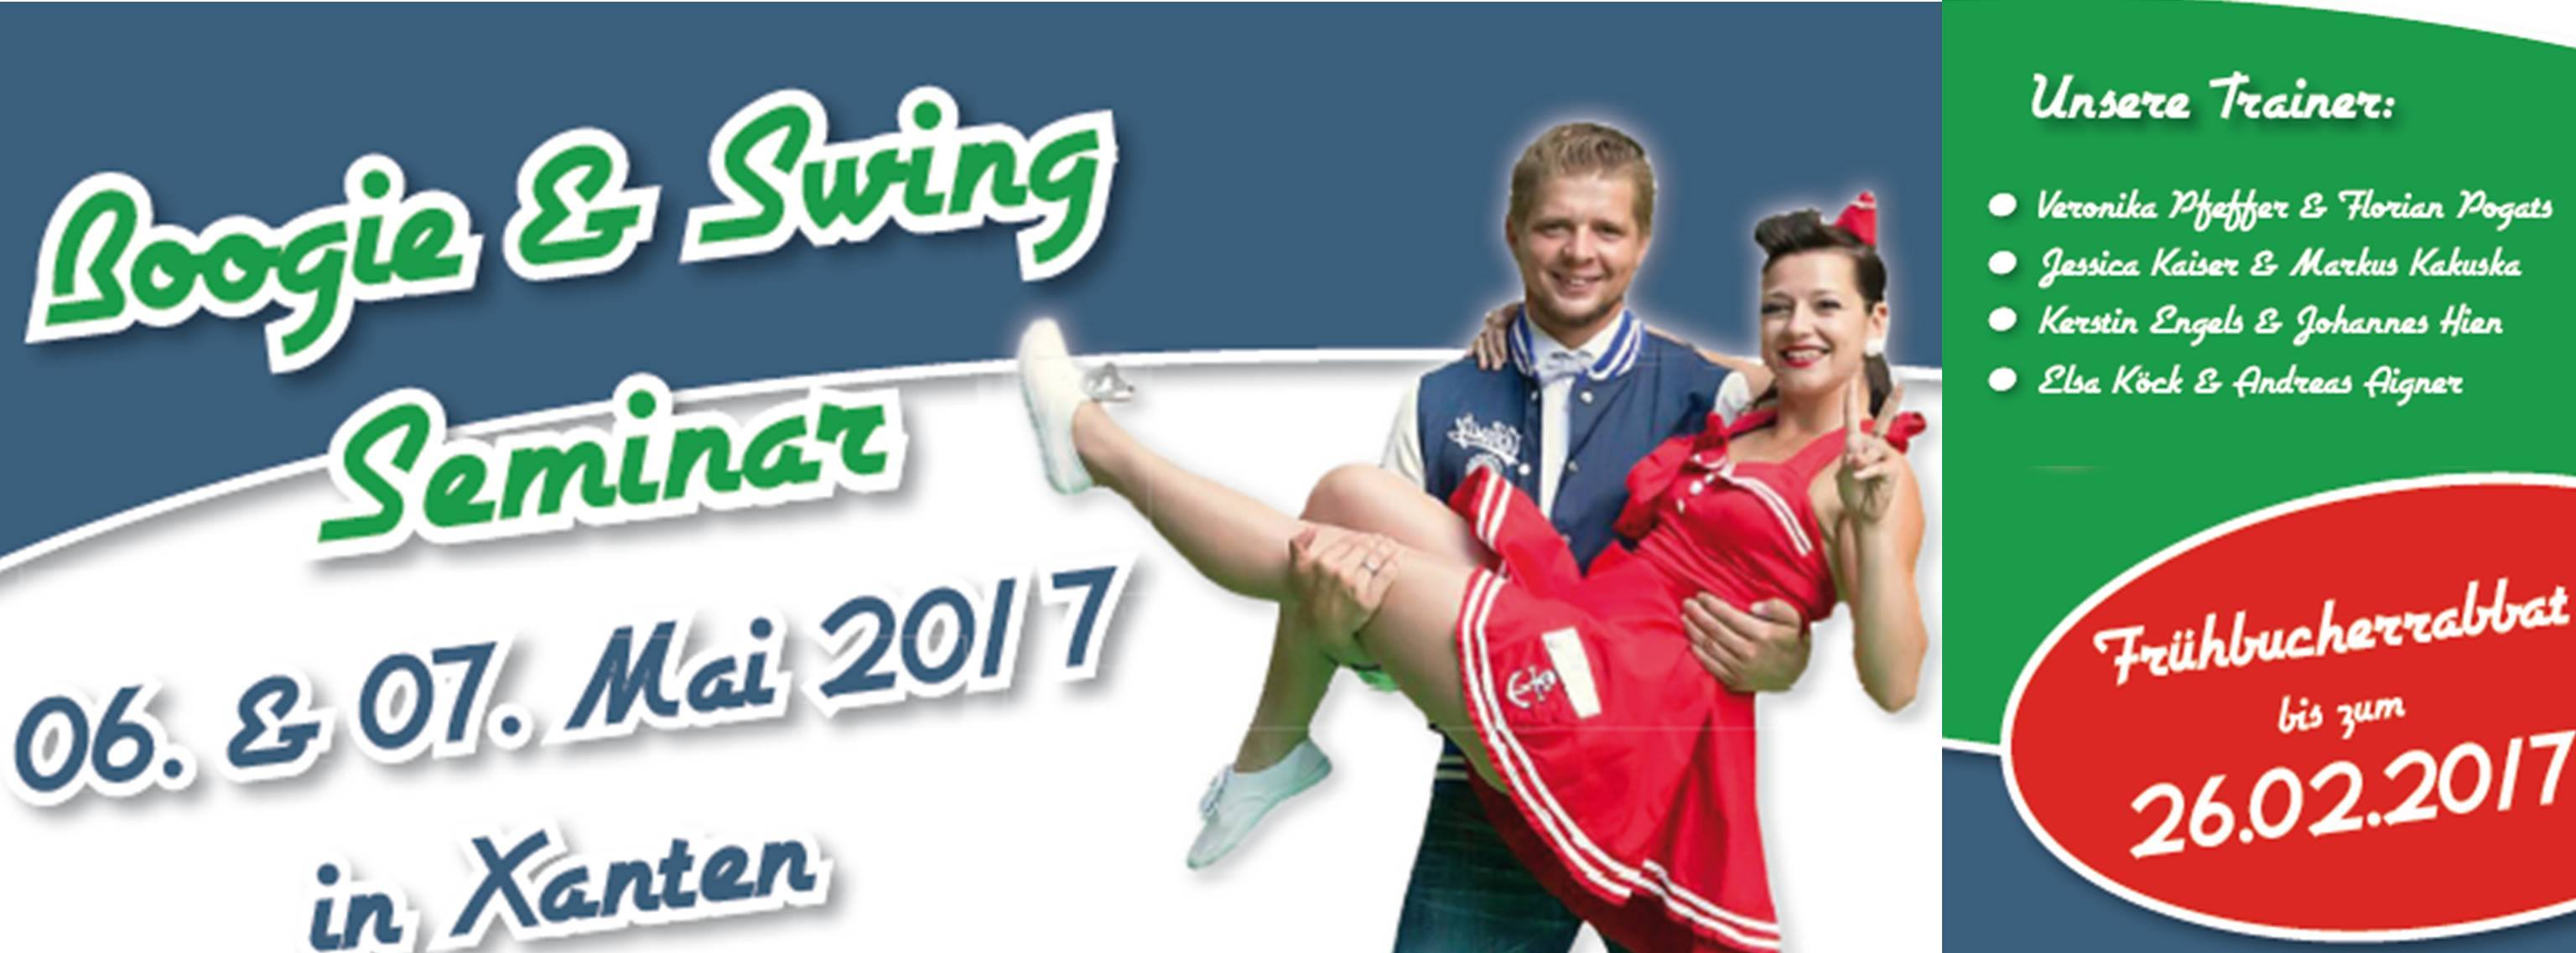 Boogie & Swing Seminar in Xanten